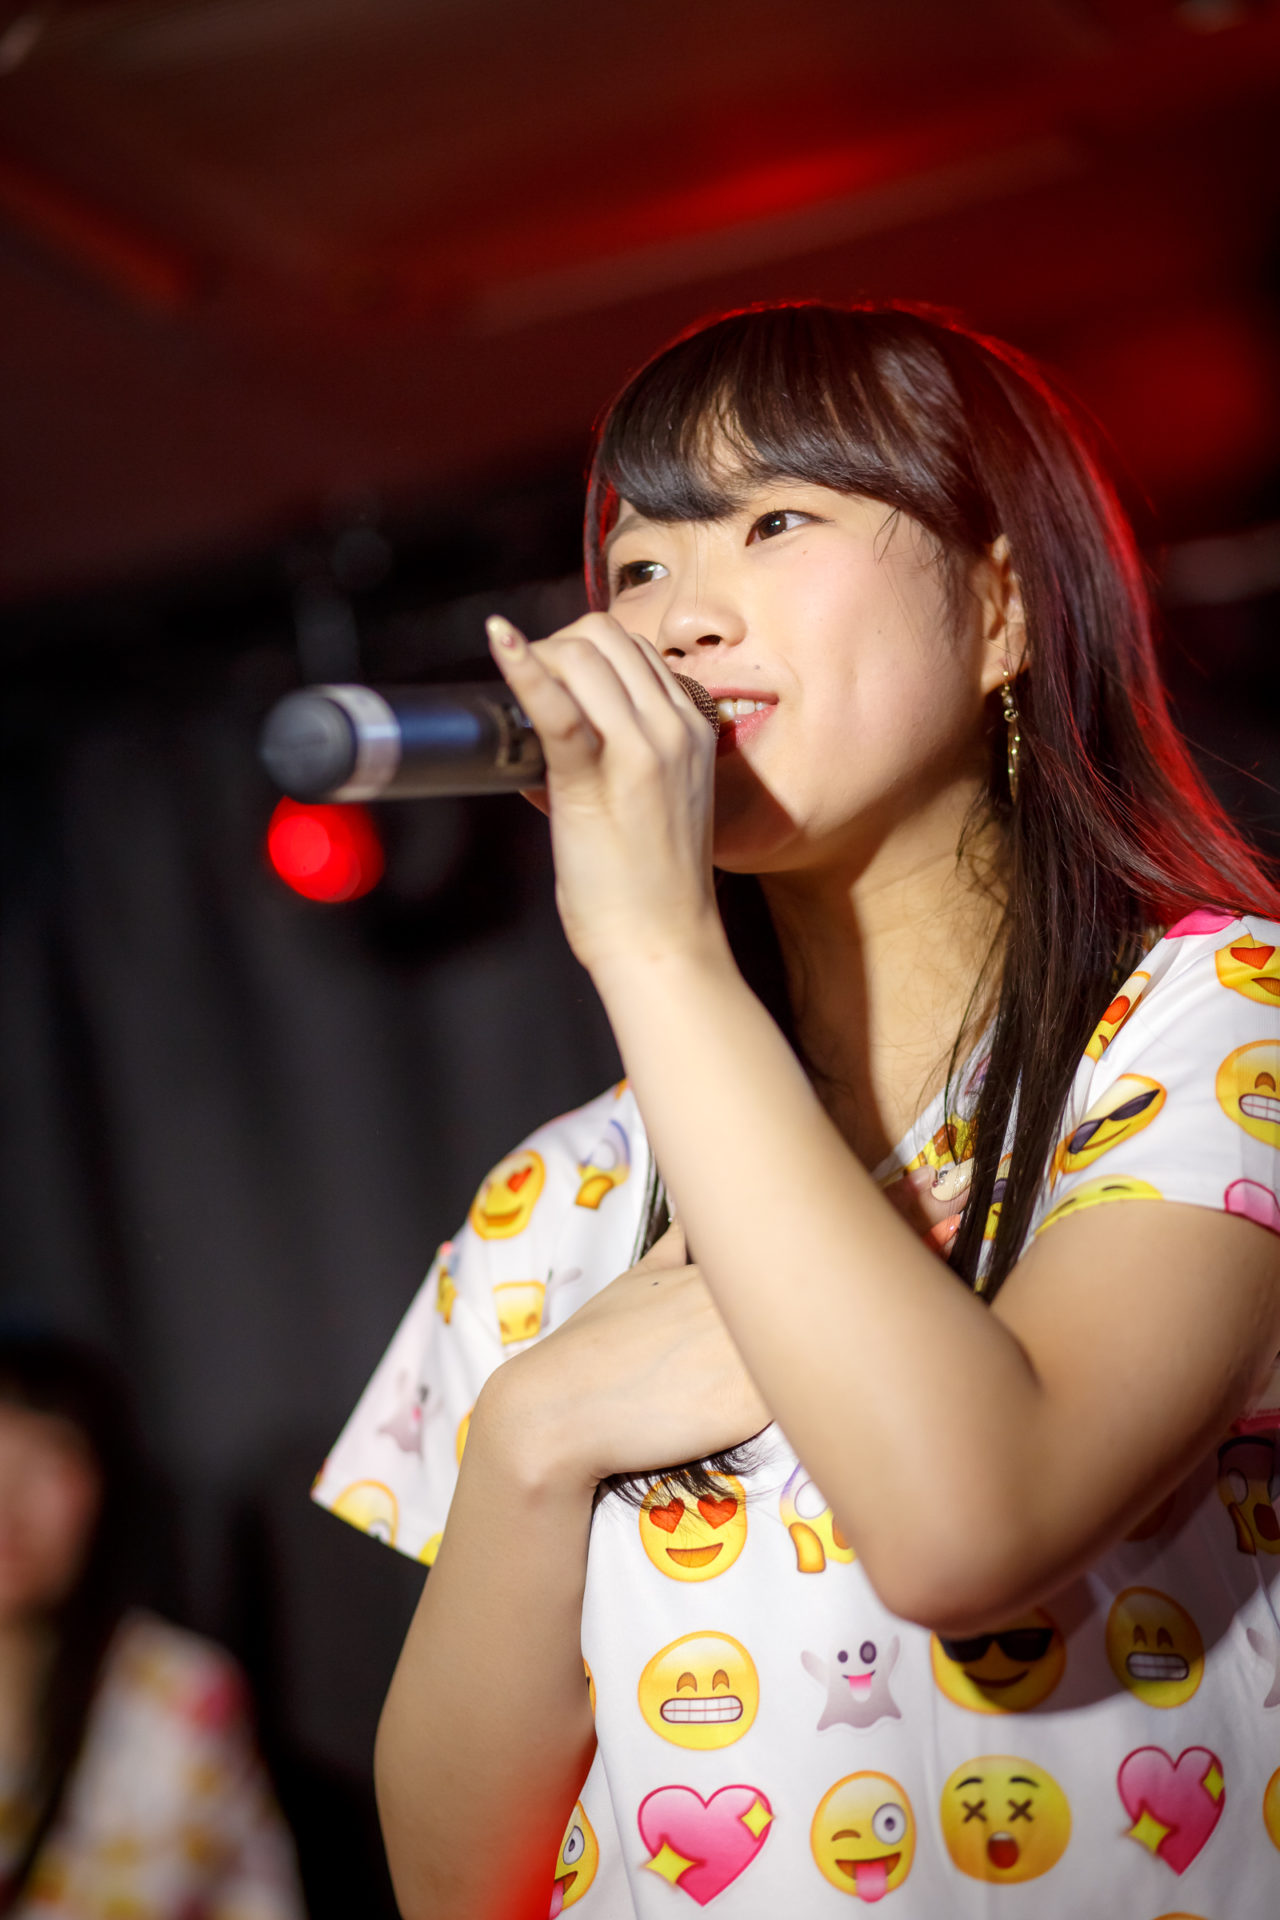 POPPING☆SMILE あすか ( 橋本明日香 ) | 苗の木LIVE Vol.27 ~お賽銭LIVE 春の陣~